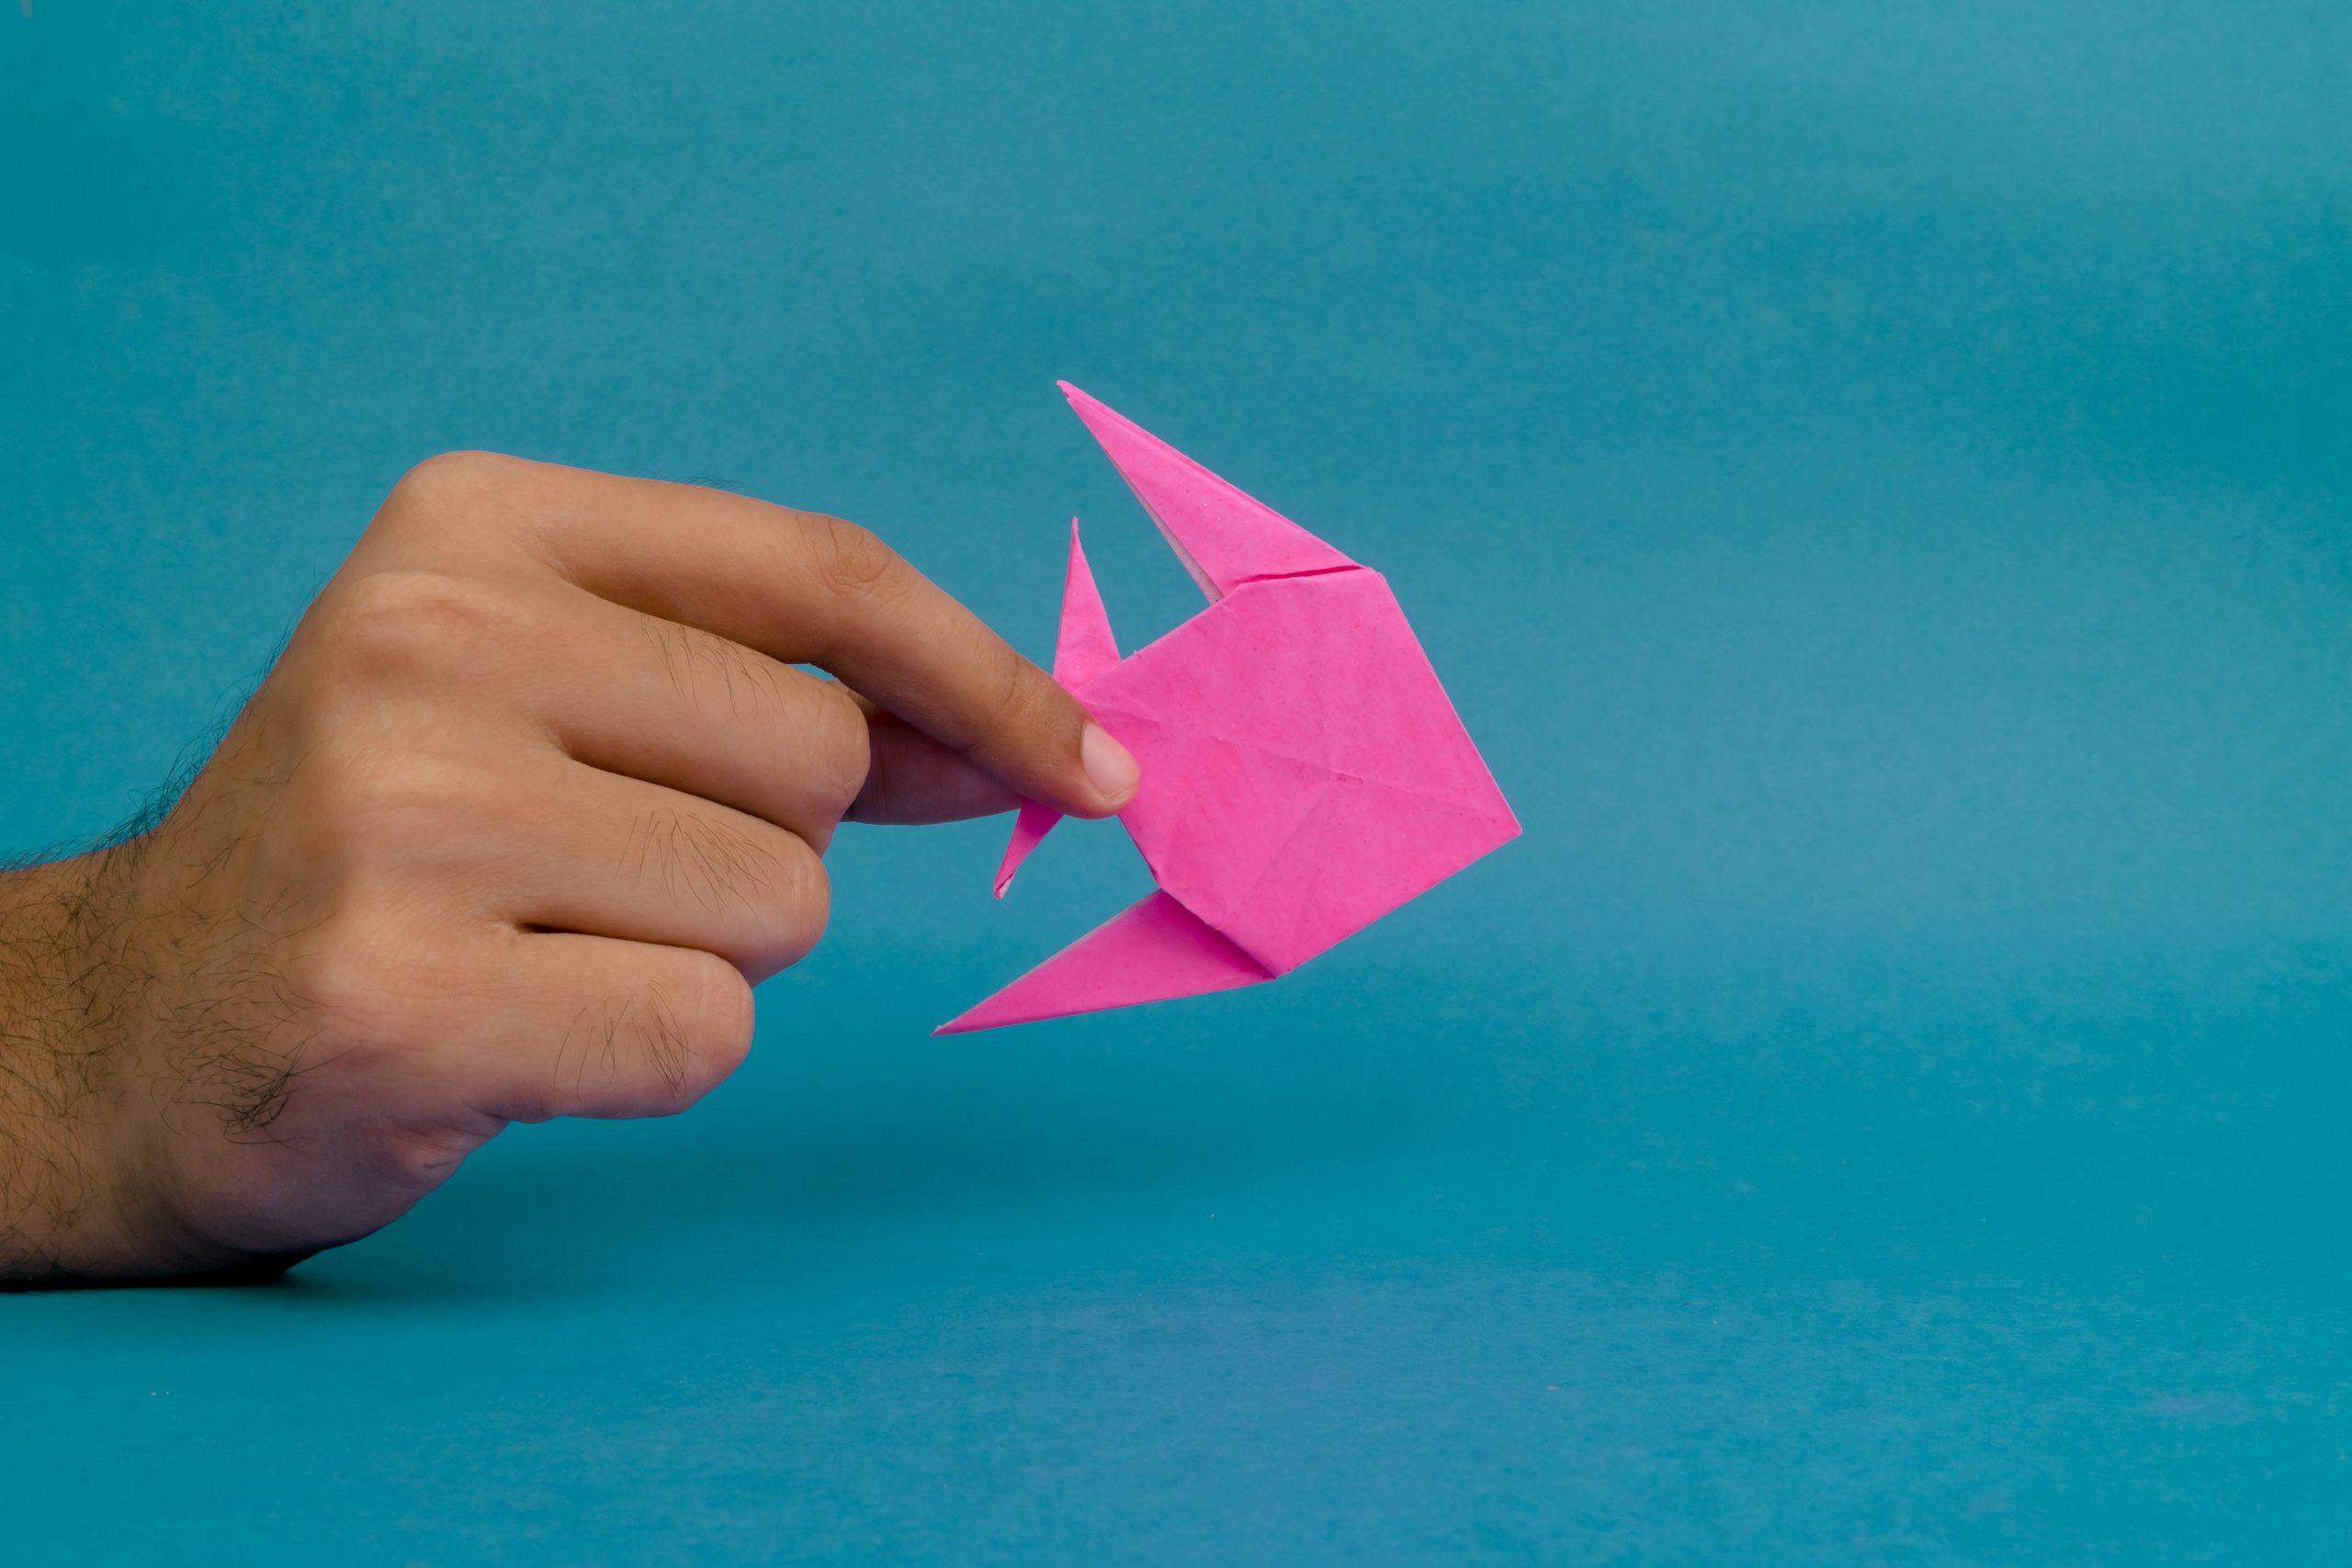 Origami fish in hand